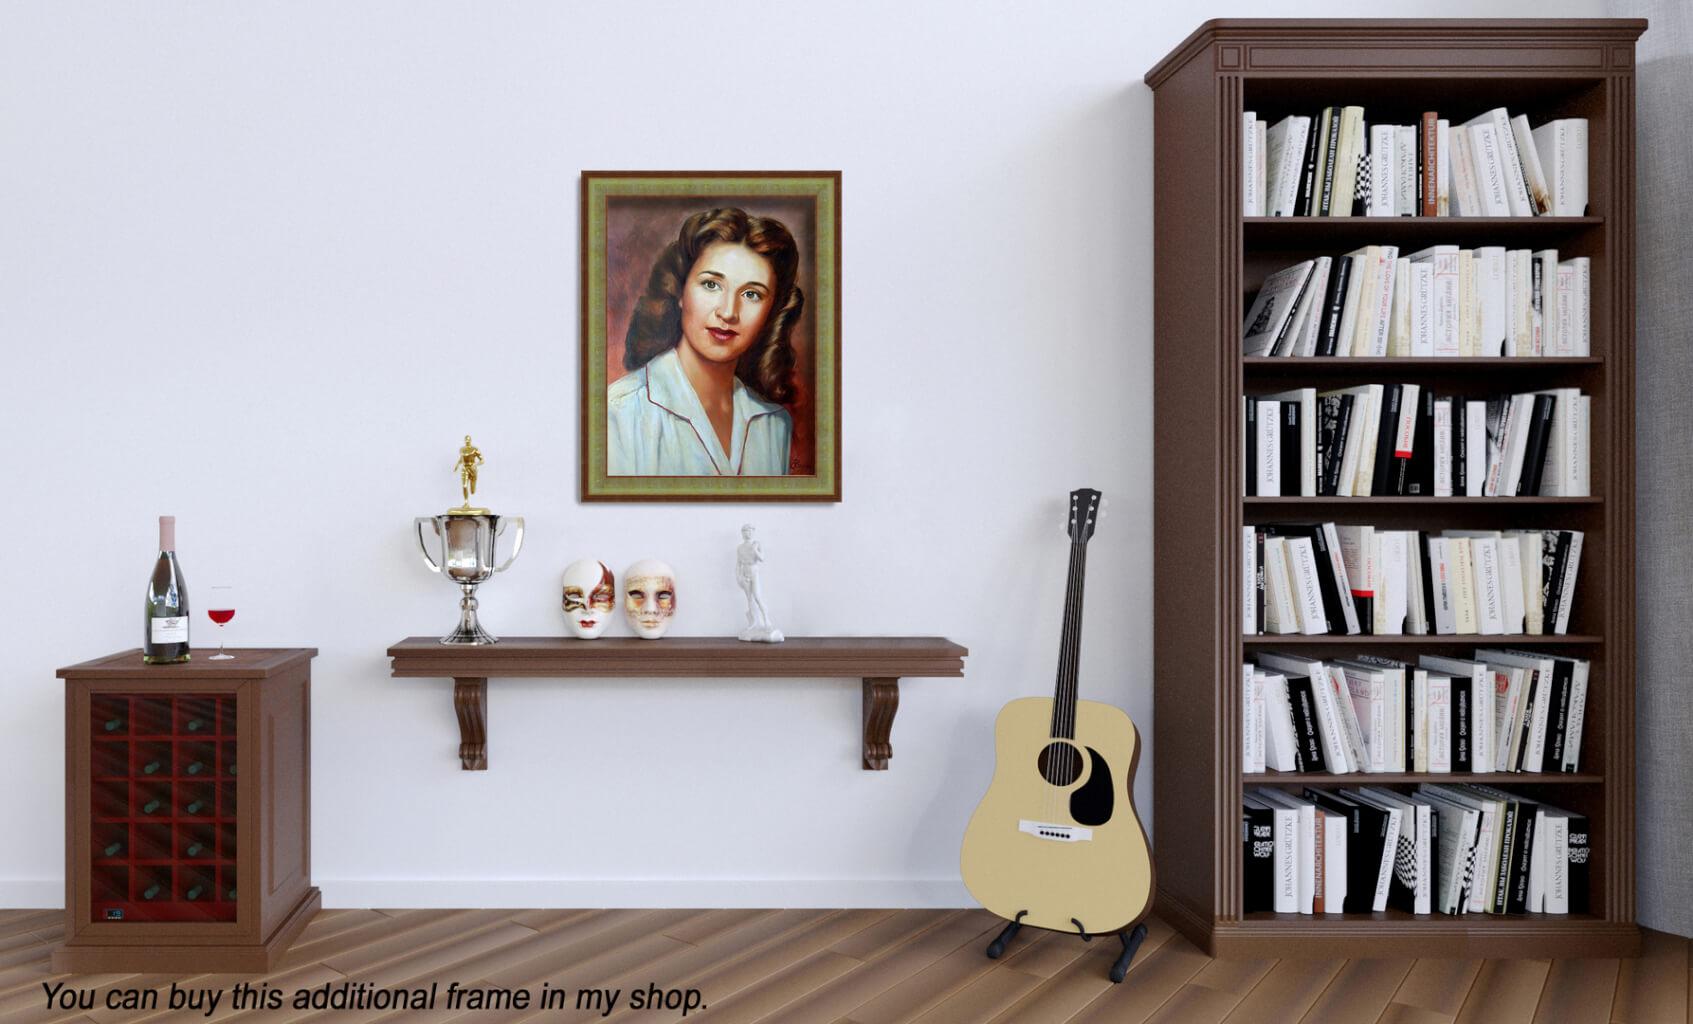 Kobus woman portrait img_8